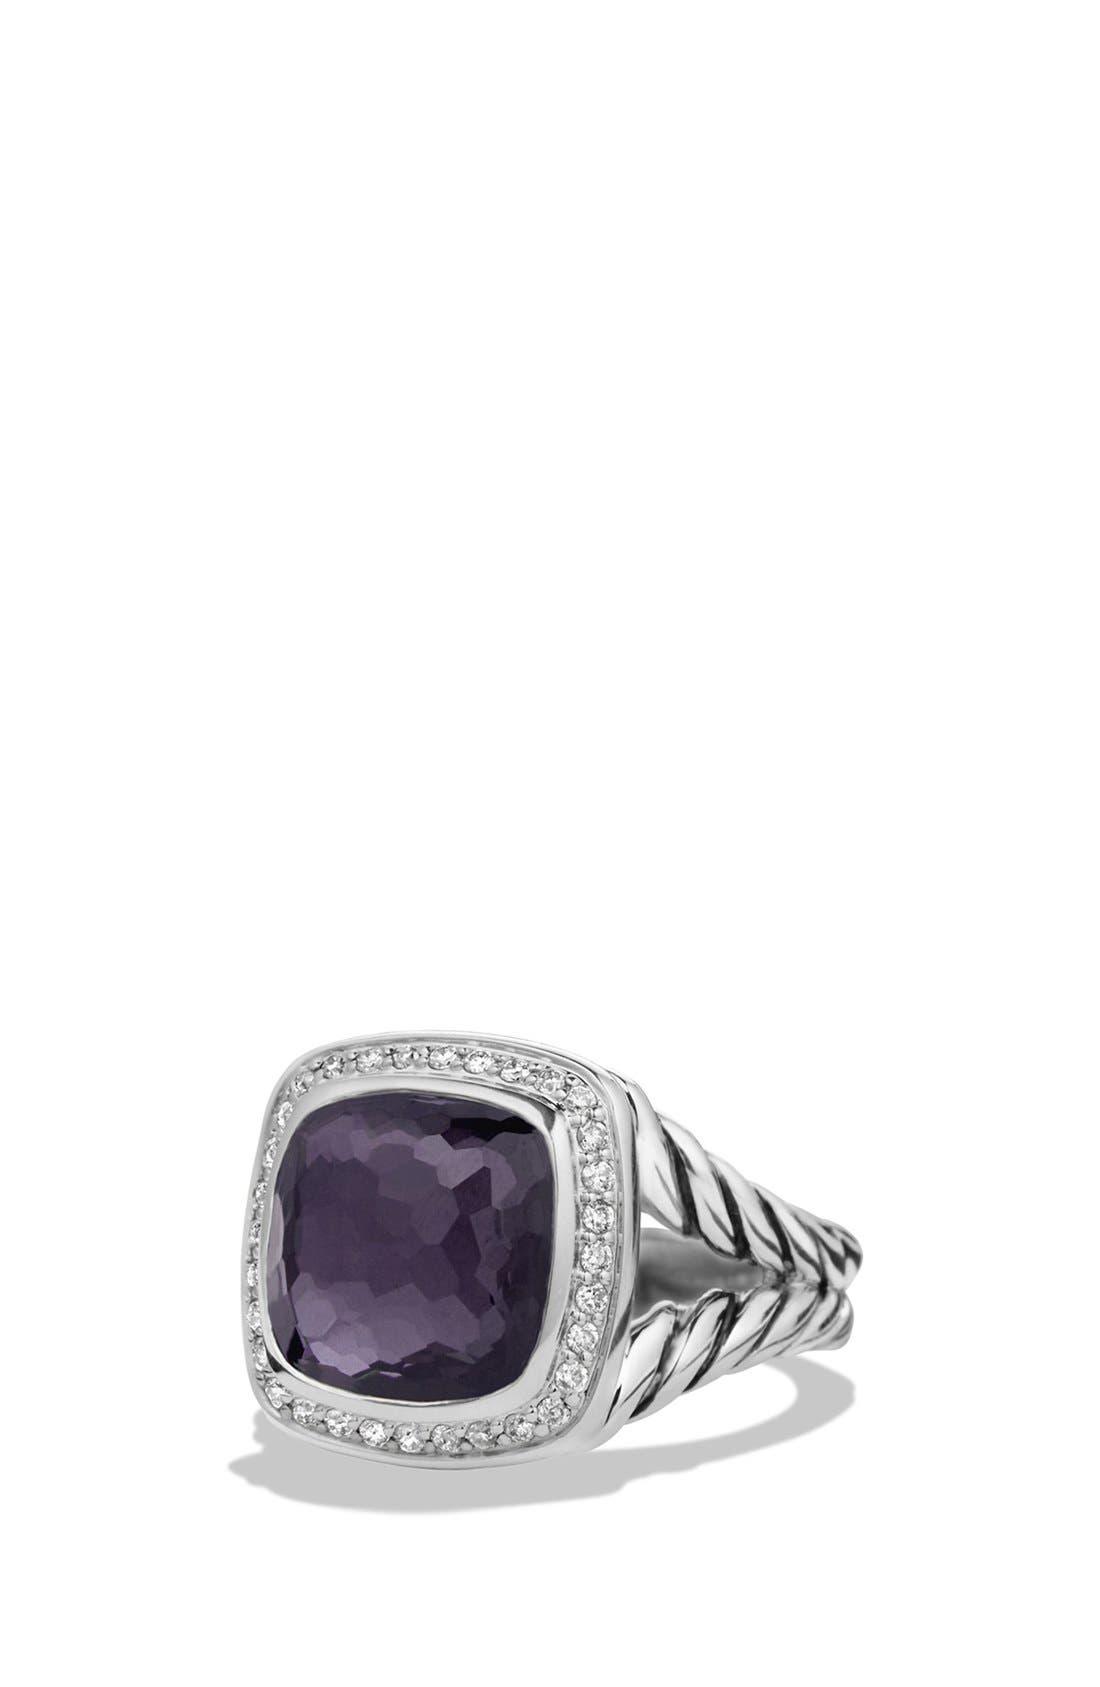 David Yurman'Albion' Ring with Semiprecious Stone and Diamonds